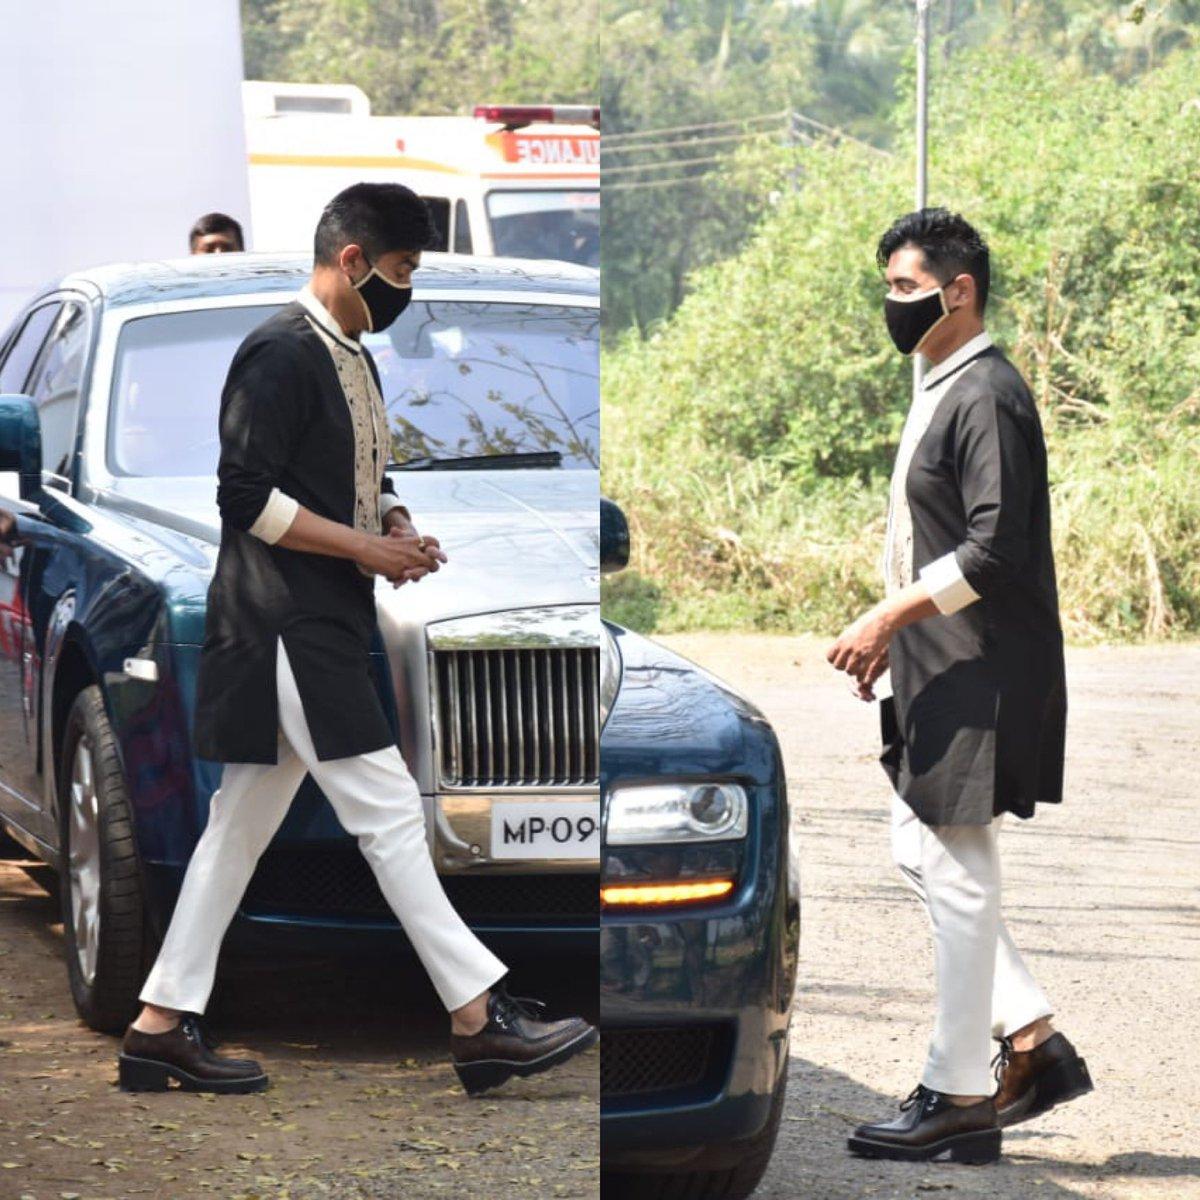 Manish Malhotra #snapped at @Varun_dvn 's wedding venue at Alibaugh 😍😍😍 #bollywood #bollywoodactor #bollywoodceleb #bollywoodnews #manishmalhotra #varundhawan #handsome #wedding #celebration